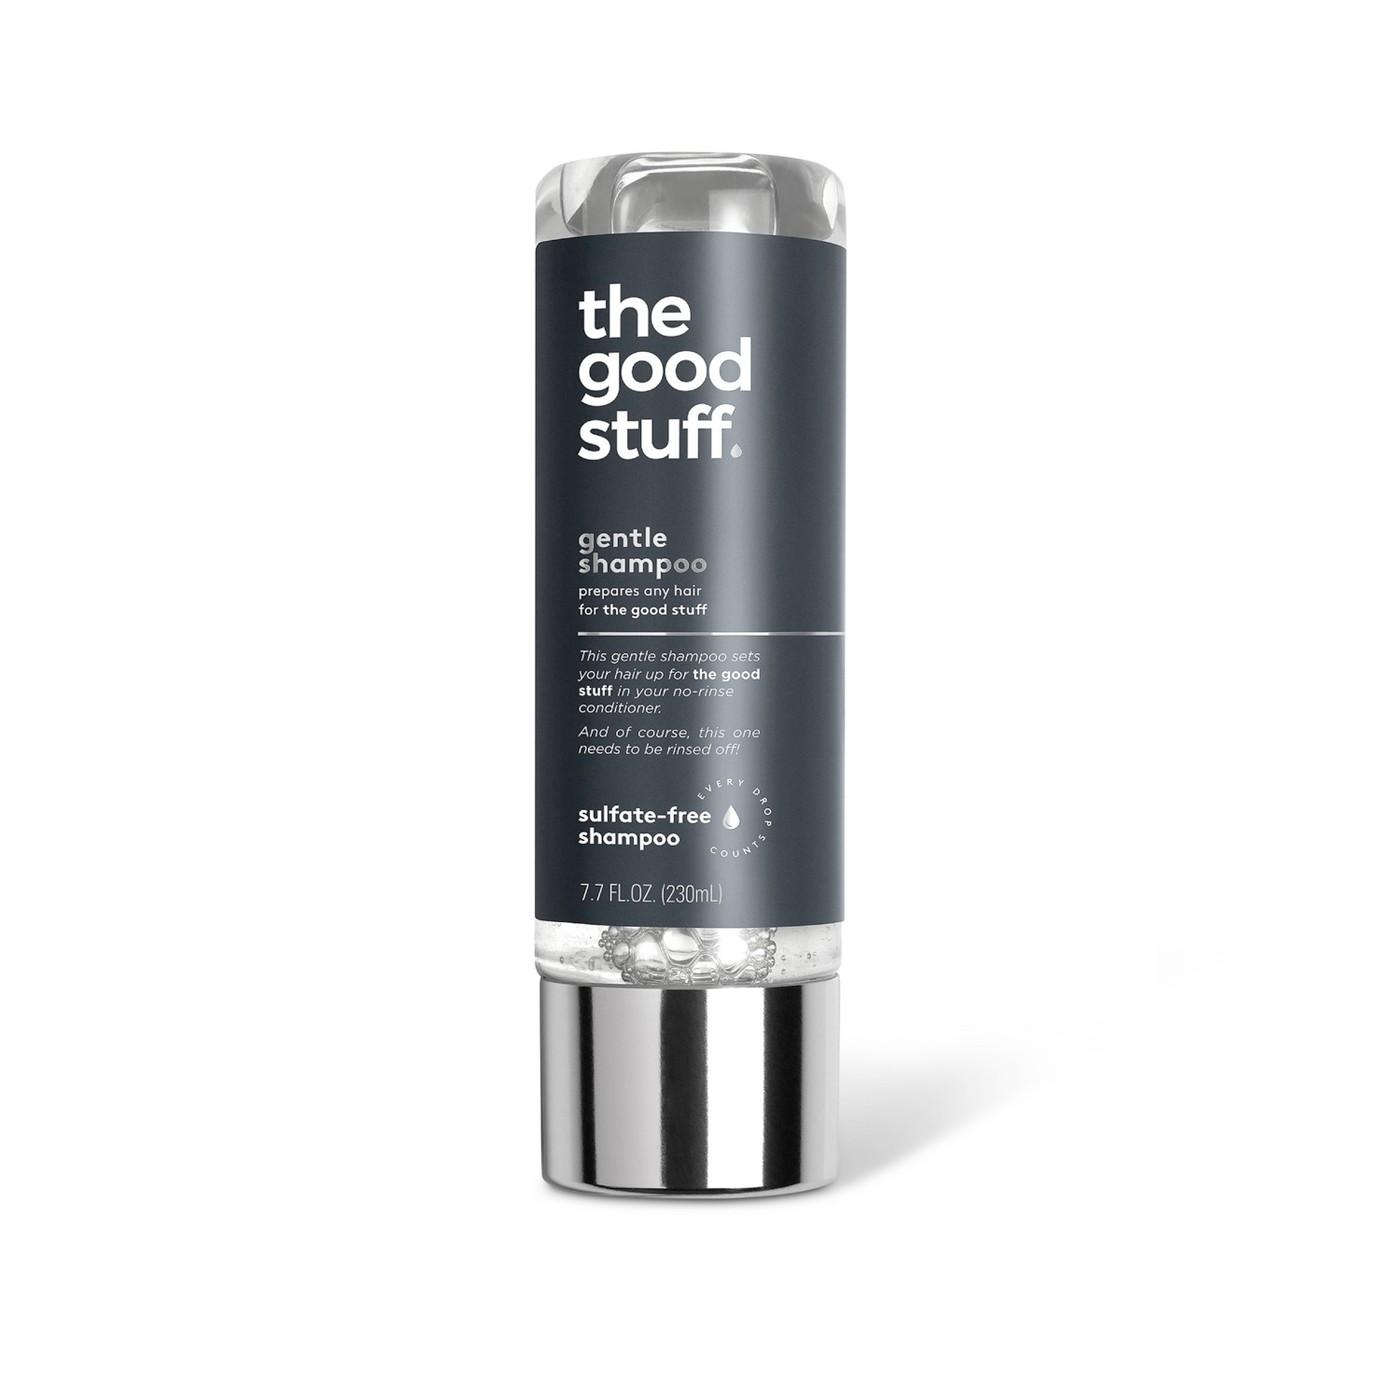 The Good Stuff Gentle Shampoo - 7.7 fl oz - image 1 of 5